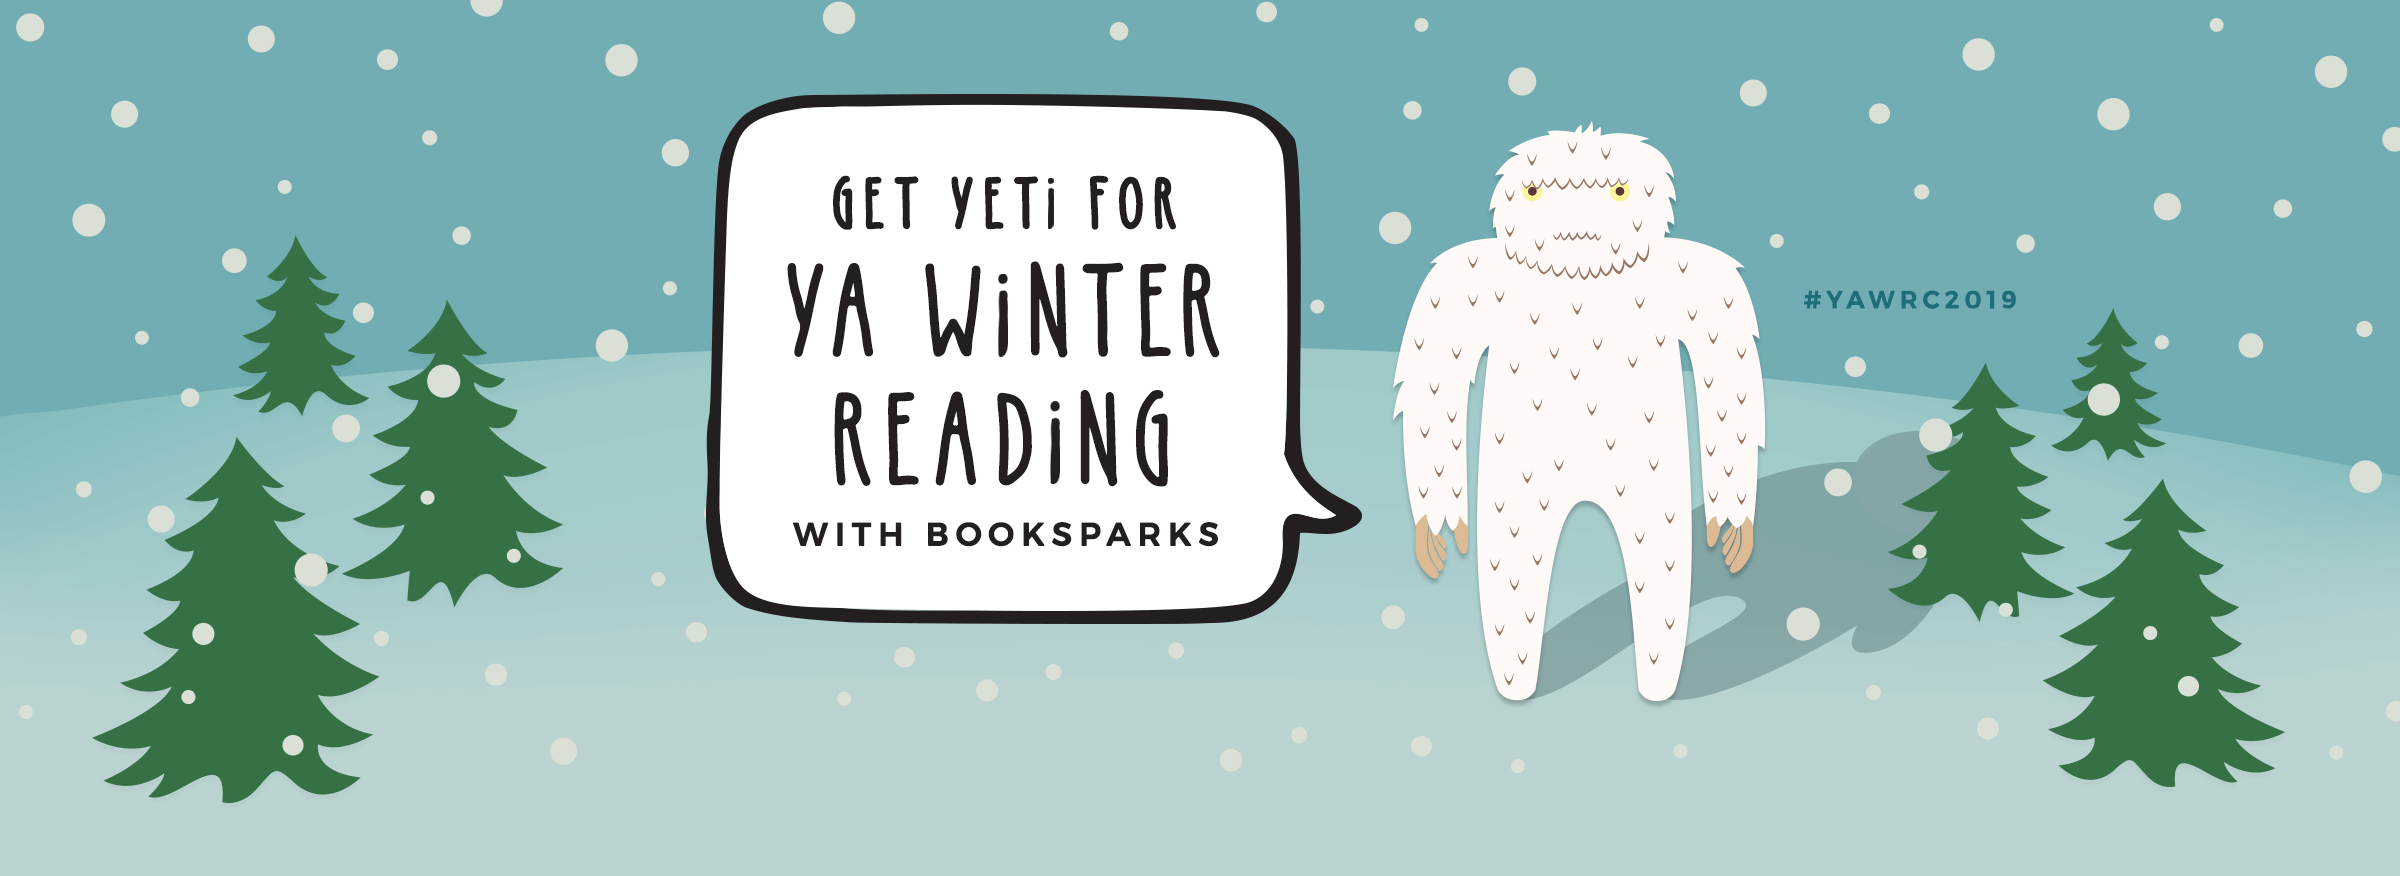 get yeti for ya winter reading